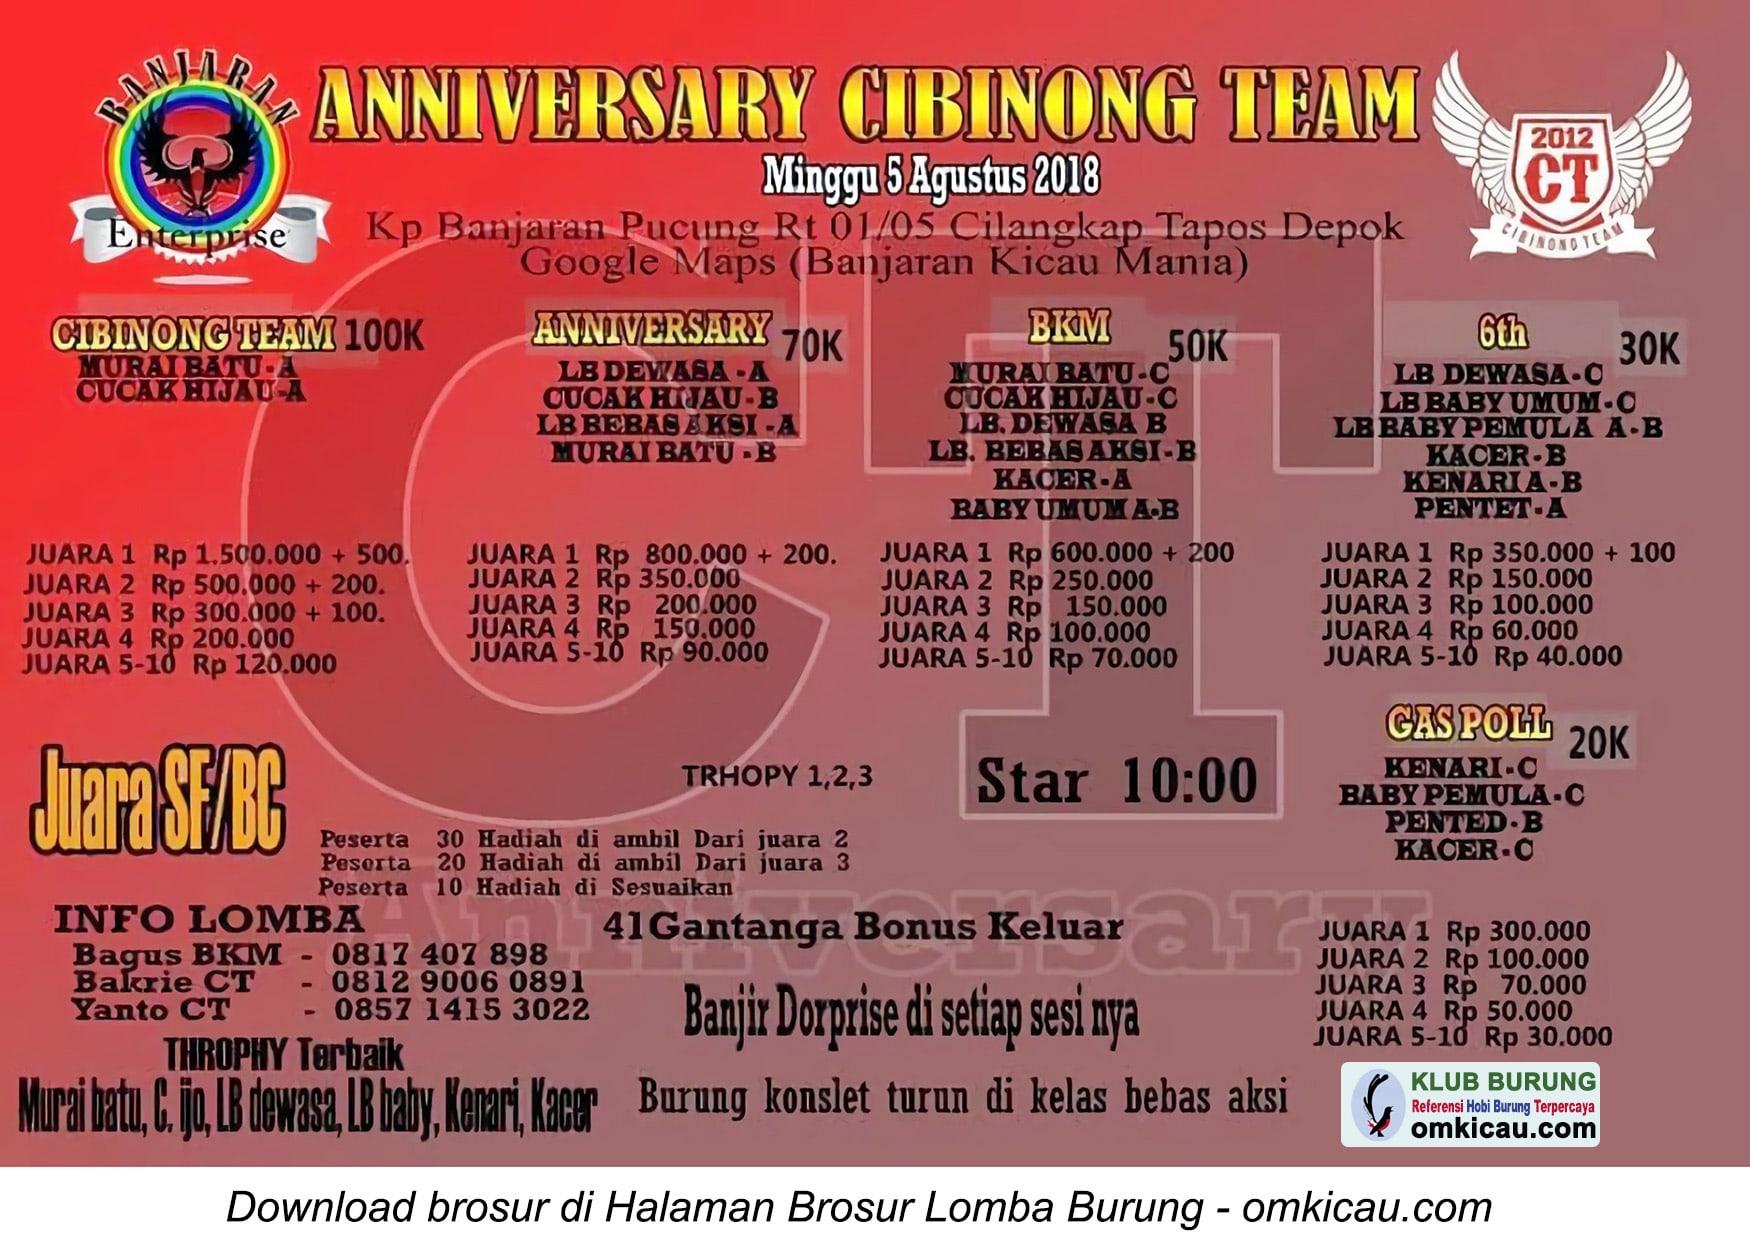 Anniversary Cibinong Team